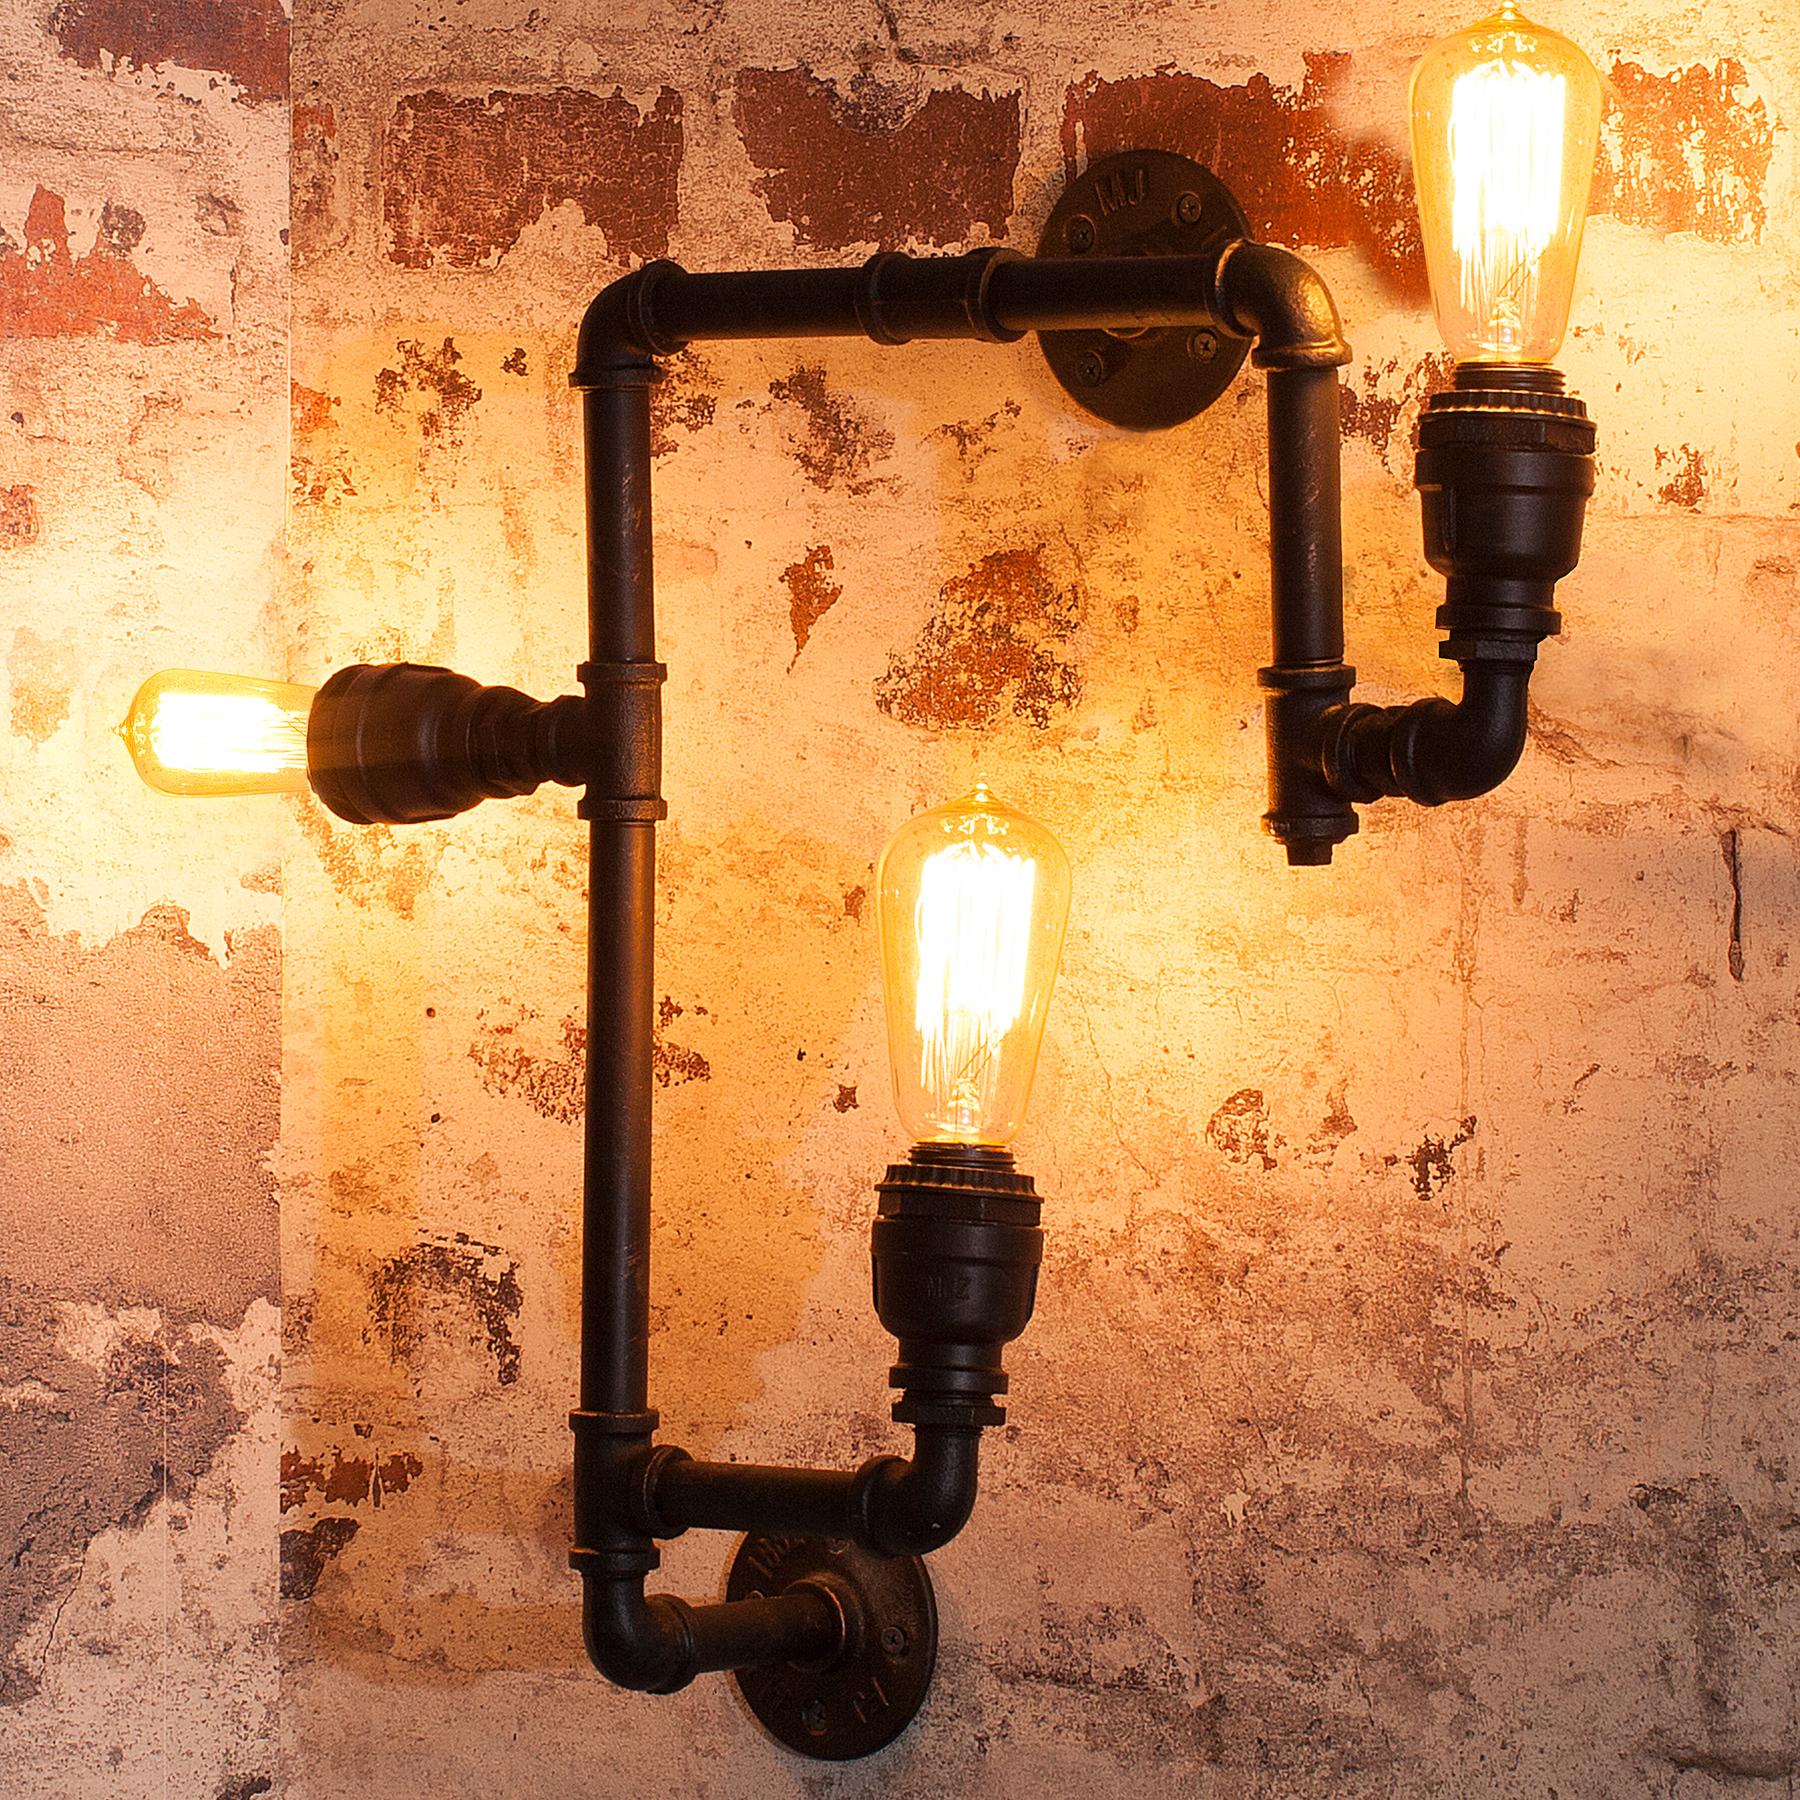 design wandleuchte hot pipe ii industrial design schwarz gold retro look lampe ebay. Black Bedroom Furniture Sets. Home Design Ideas